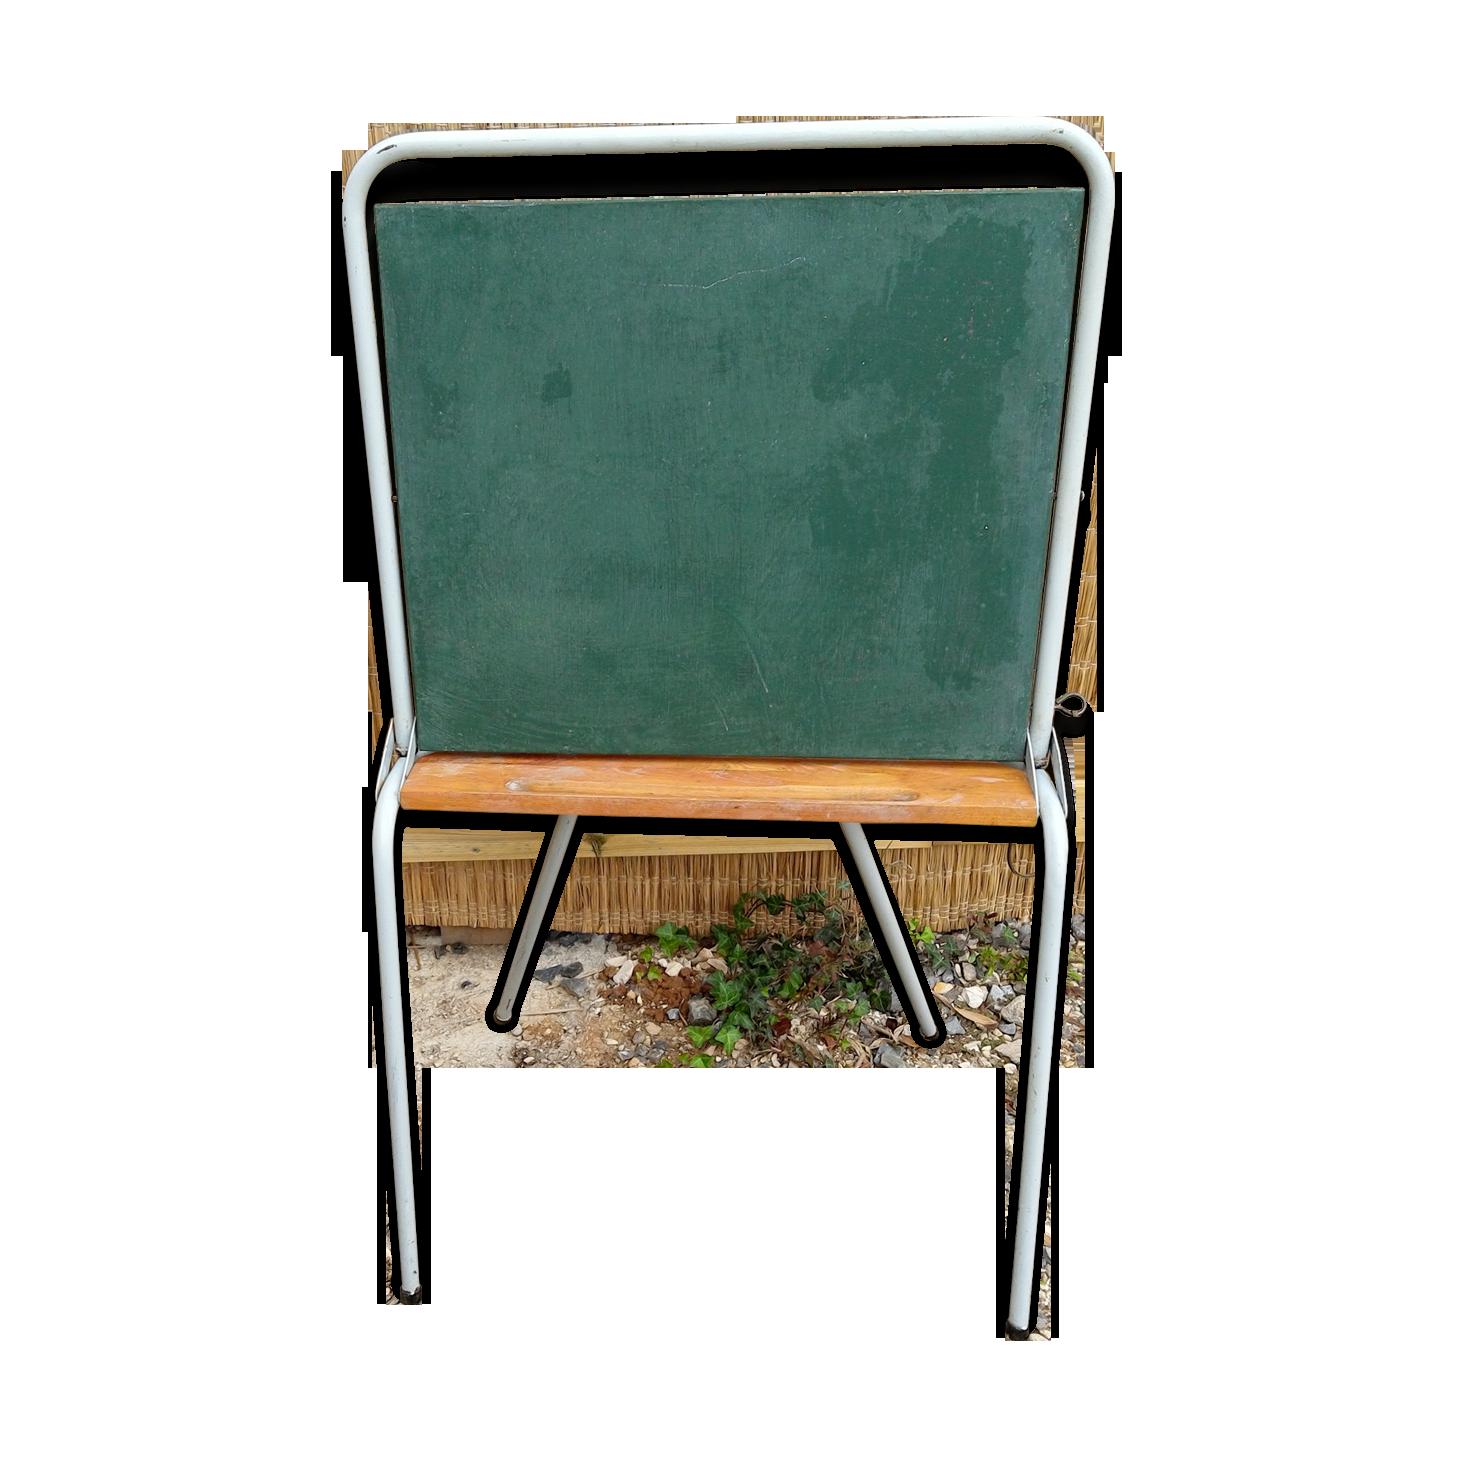 Tableau bureau colier bois Matriau vert vintage 624ga1M